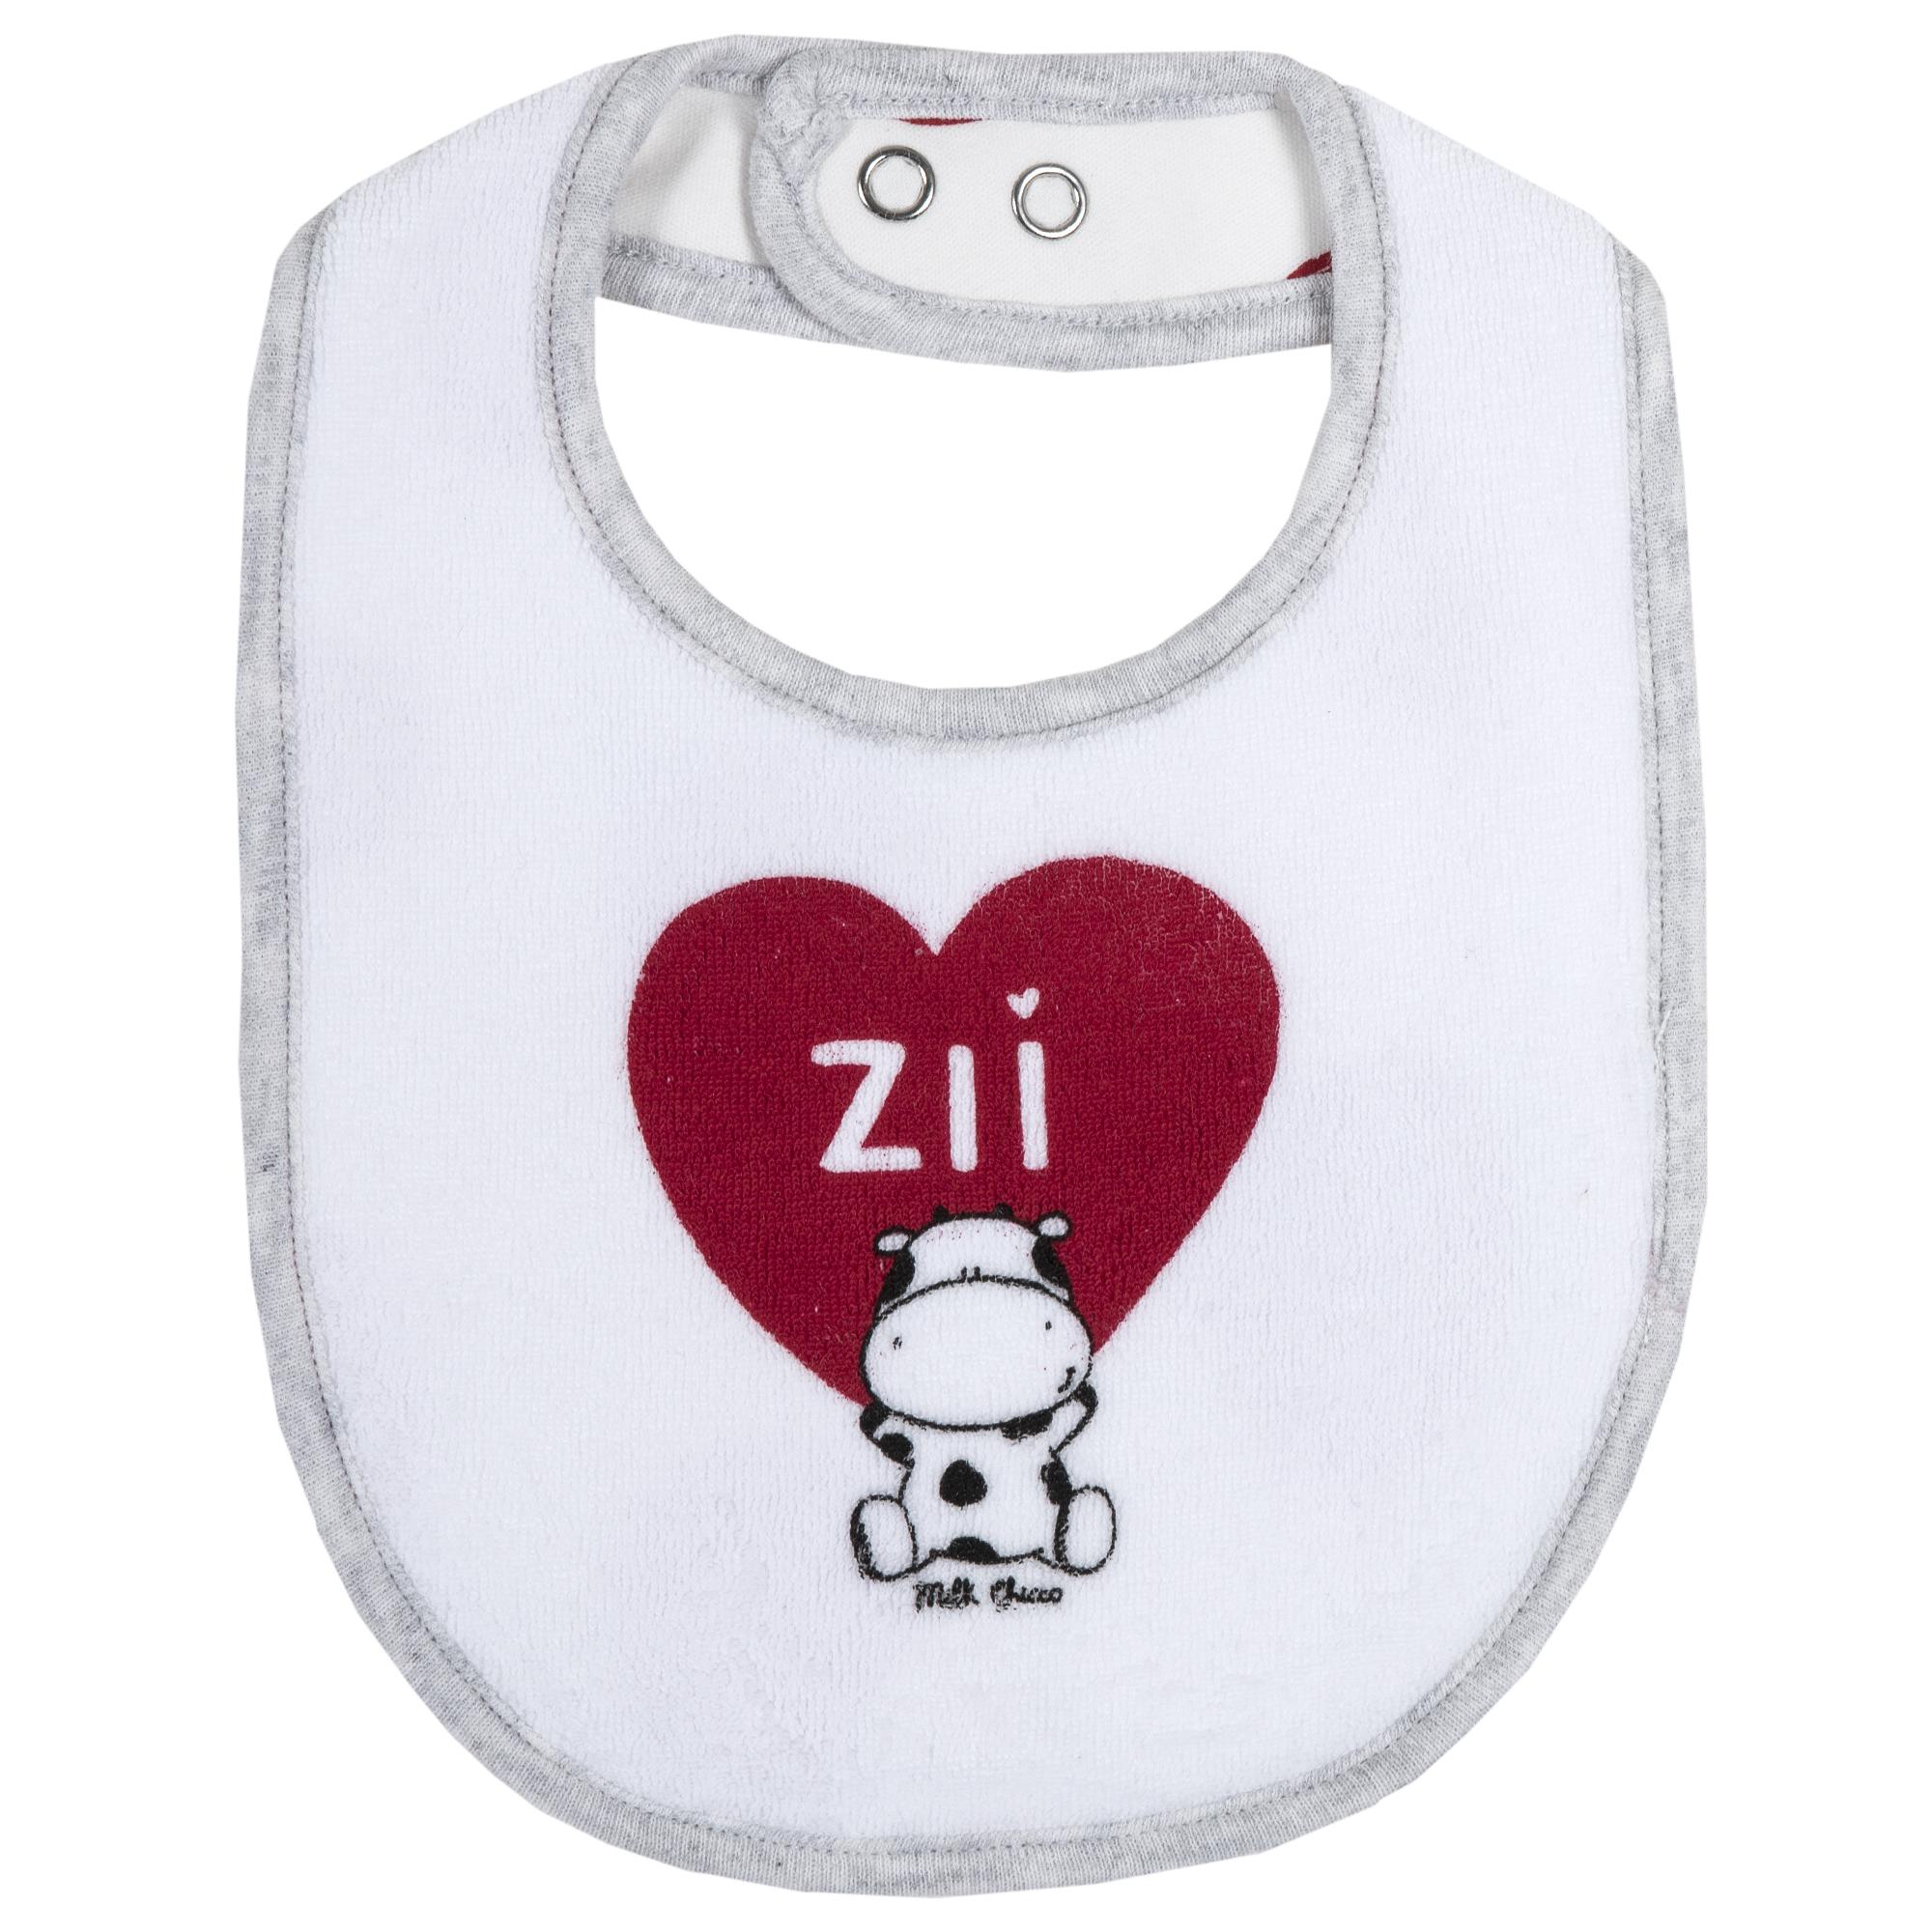 "Baveta copii Chicco, alb, ""ZII"", 32716 din categoria Bavete"